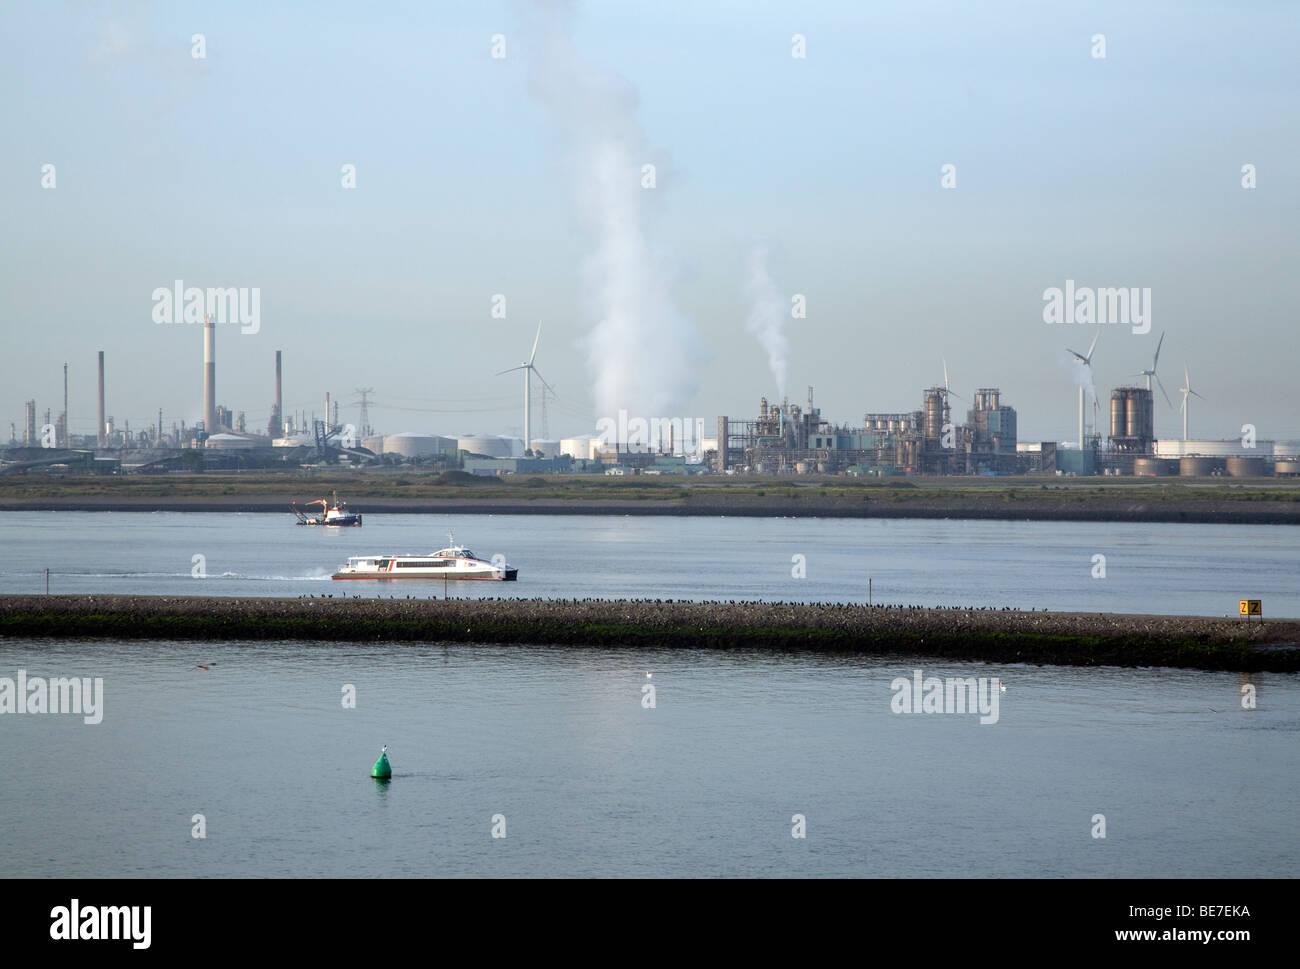 L'industrie lourde, Port de Rotterdam, Holland Photo Stock